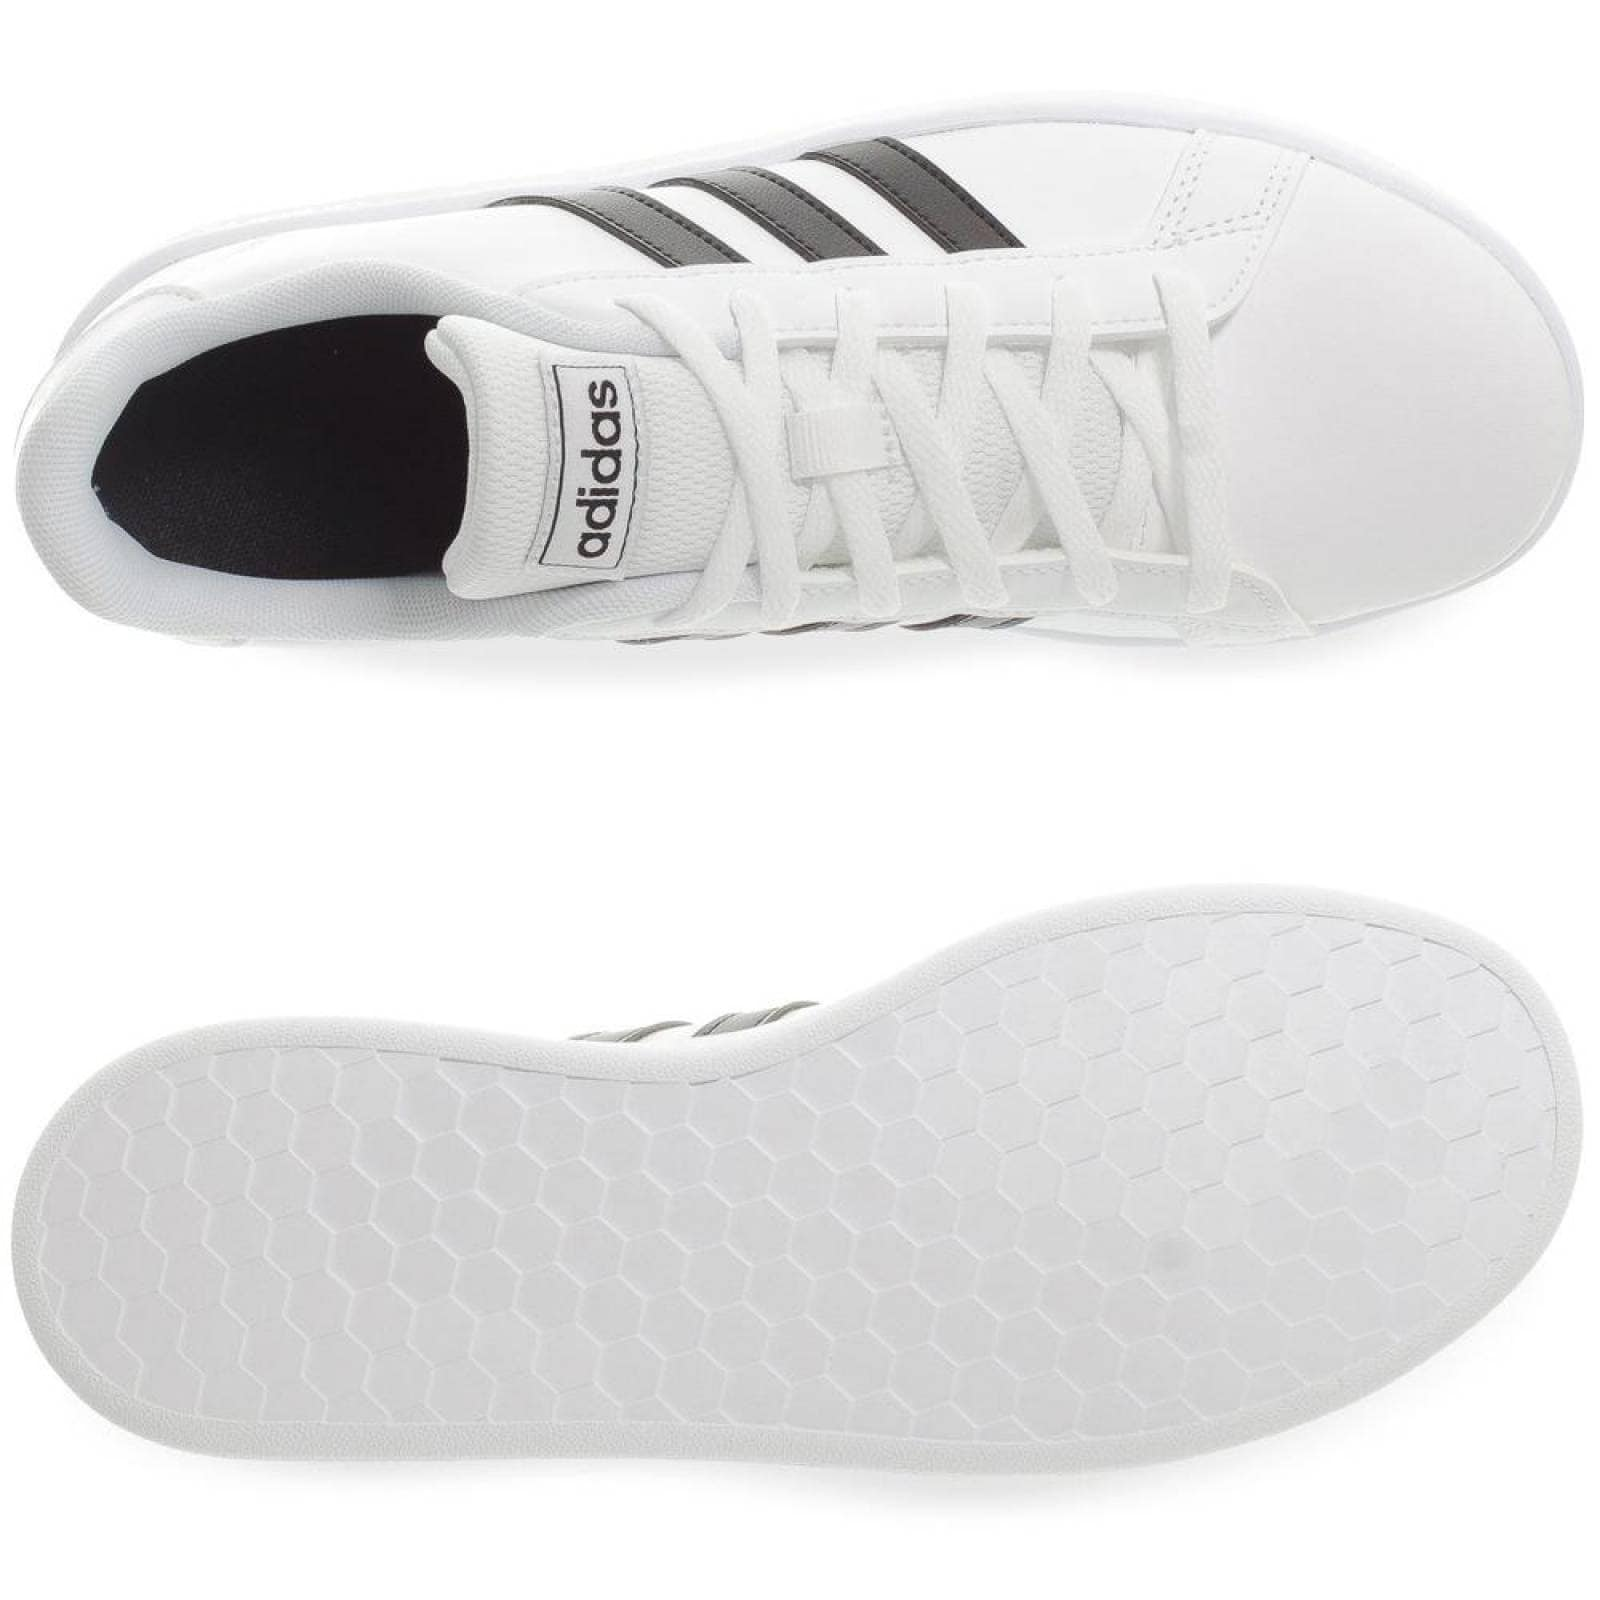 Tenis Adidas Grand Court K EF0103 Blanco Niños